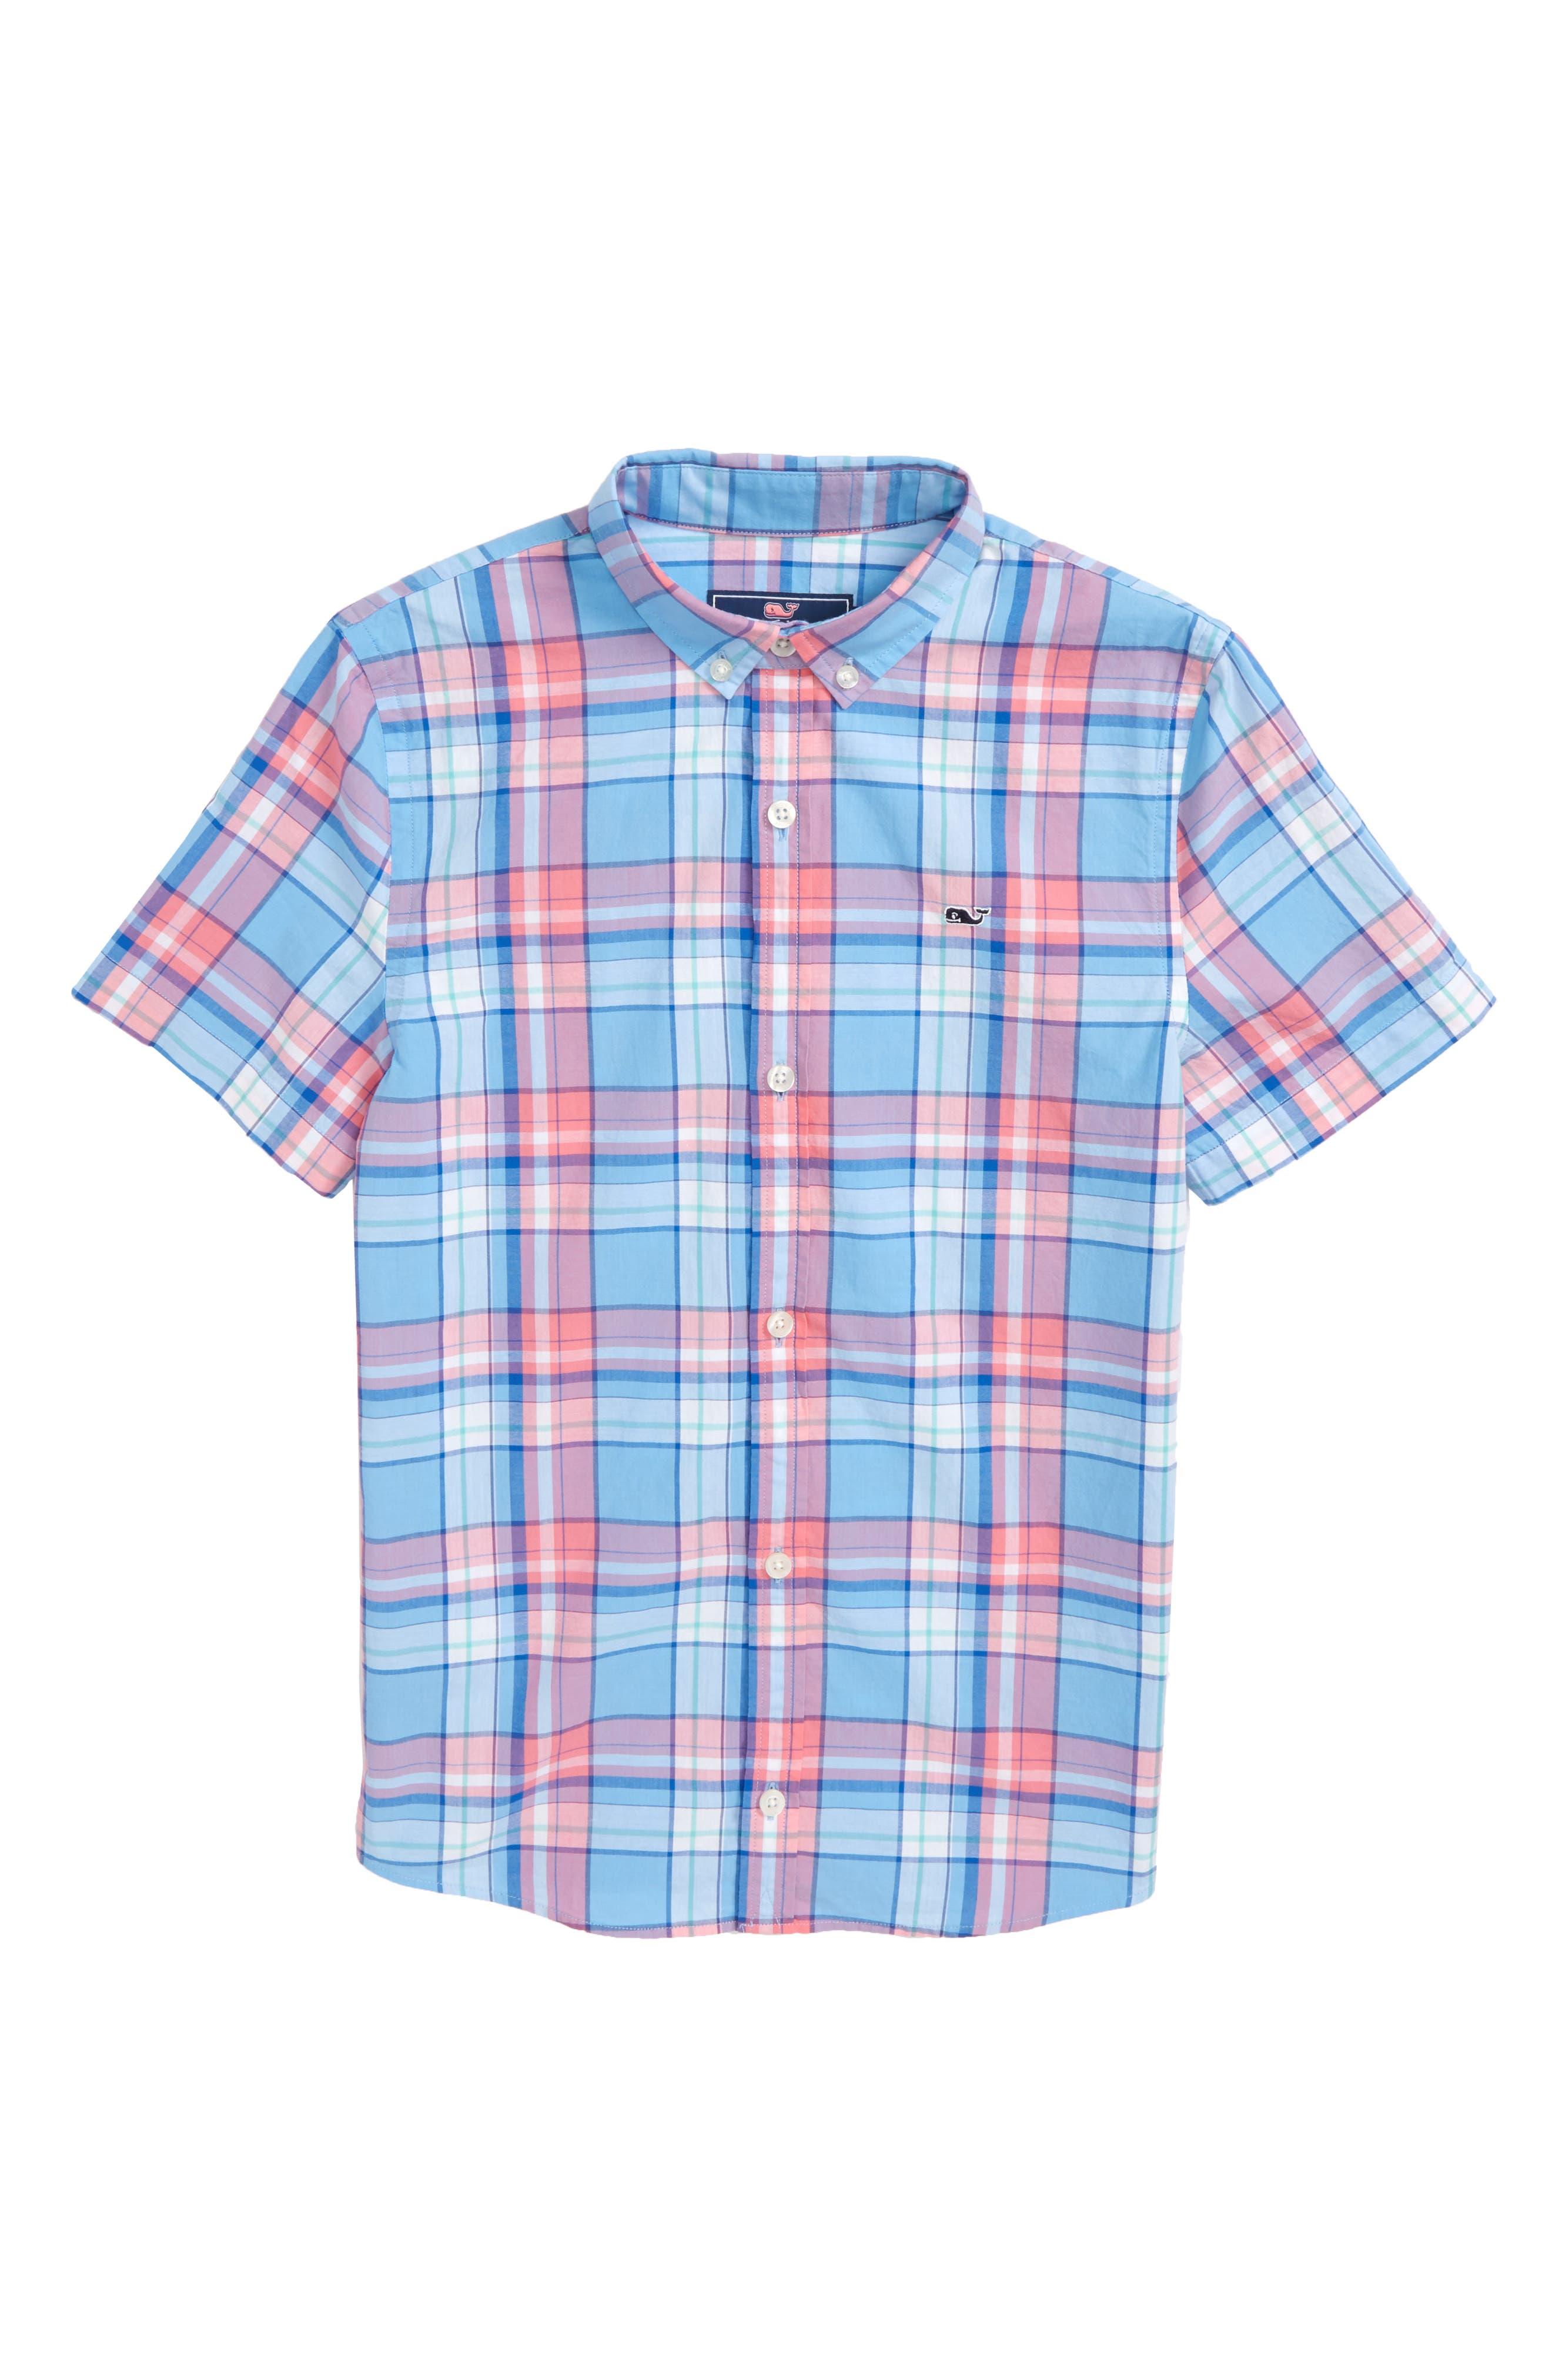 Bluff House Plaid Woven Shirt,                         Main,                         color,